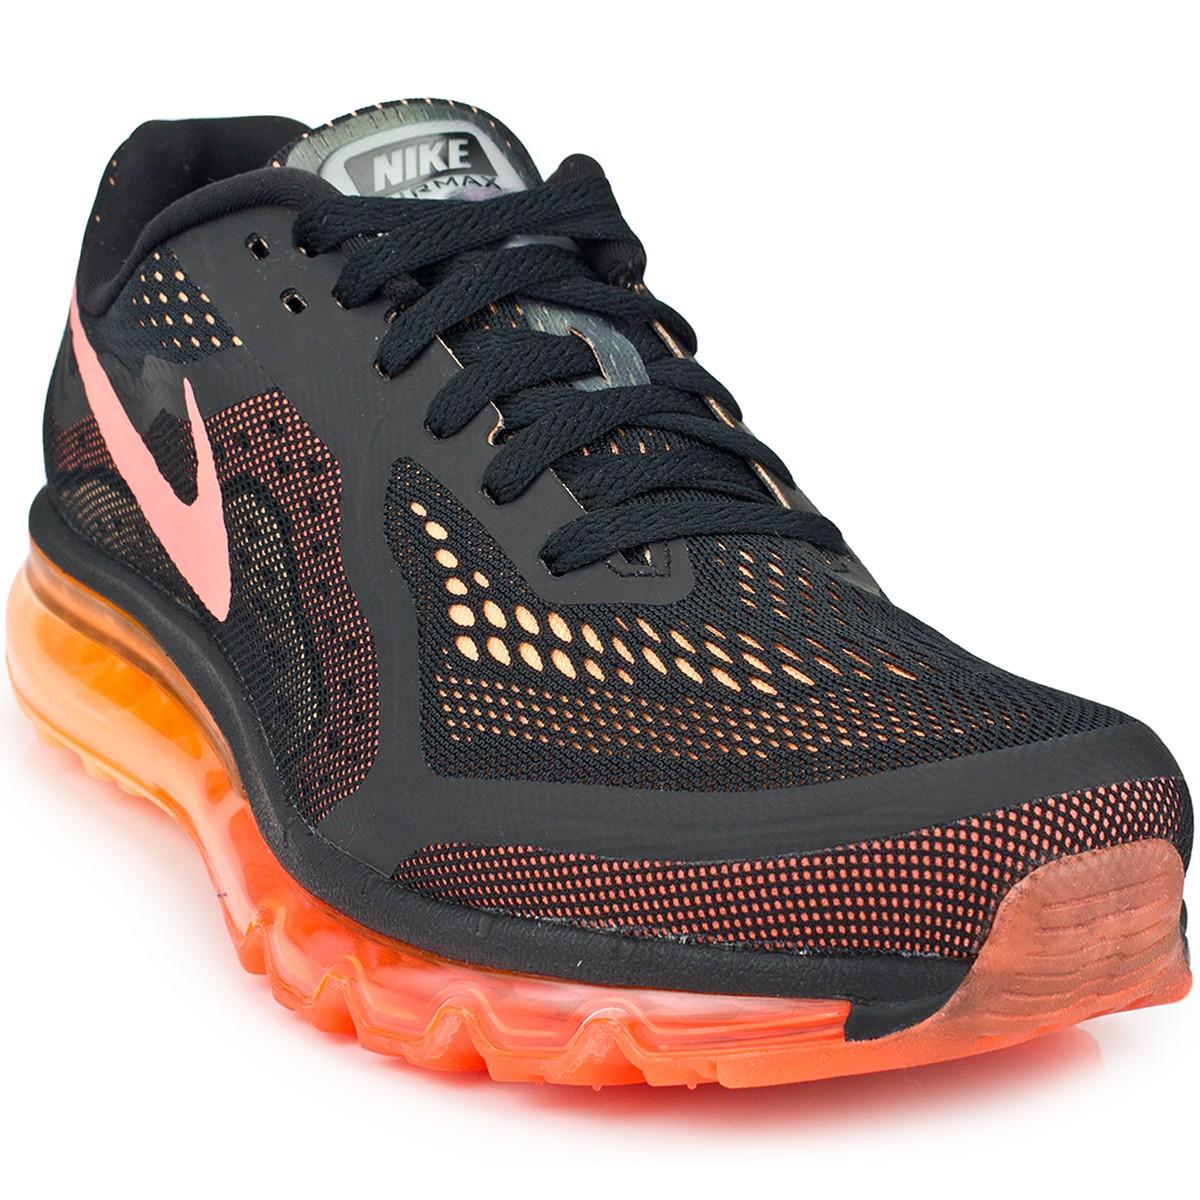 4b631cbbf21 Tênis Nike Air Max 2014 621077